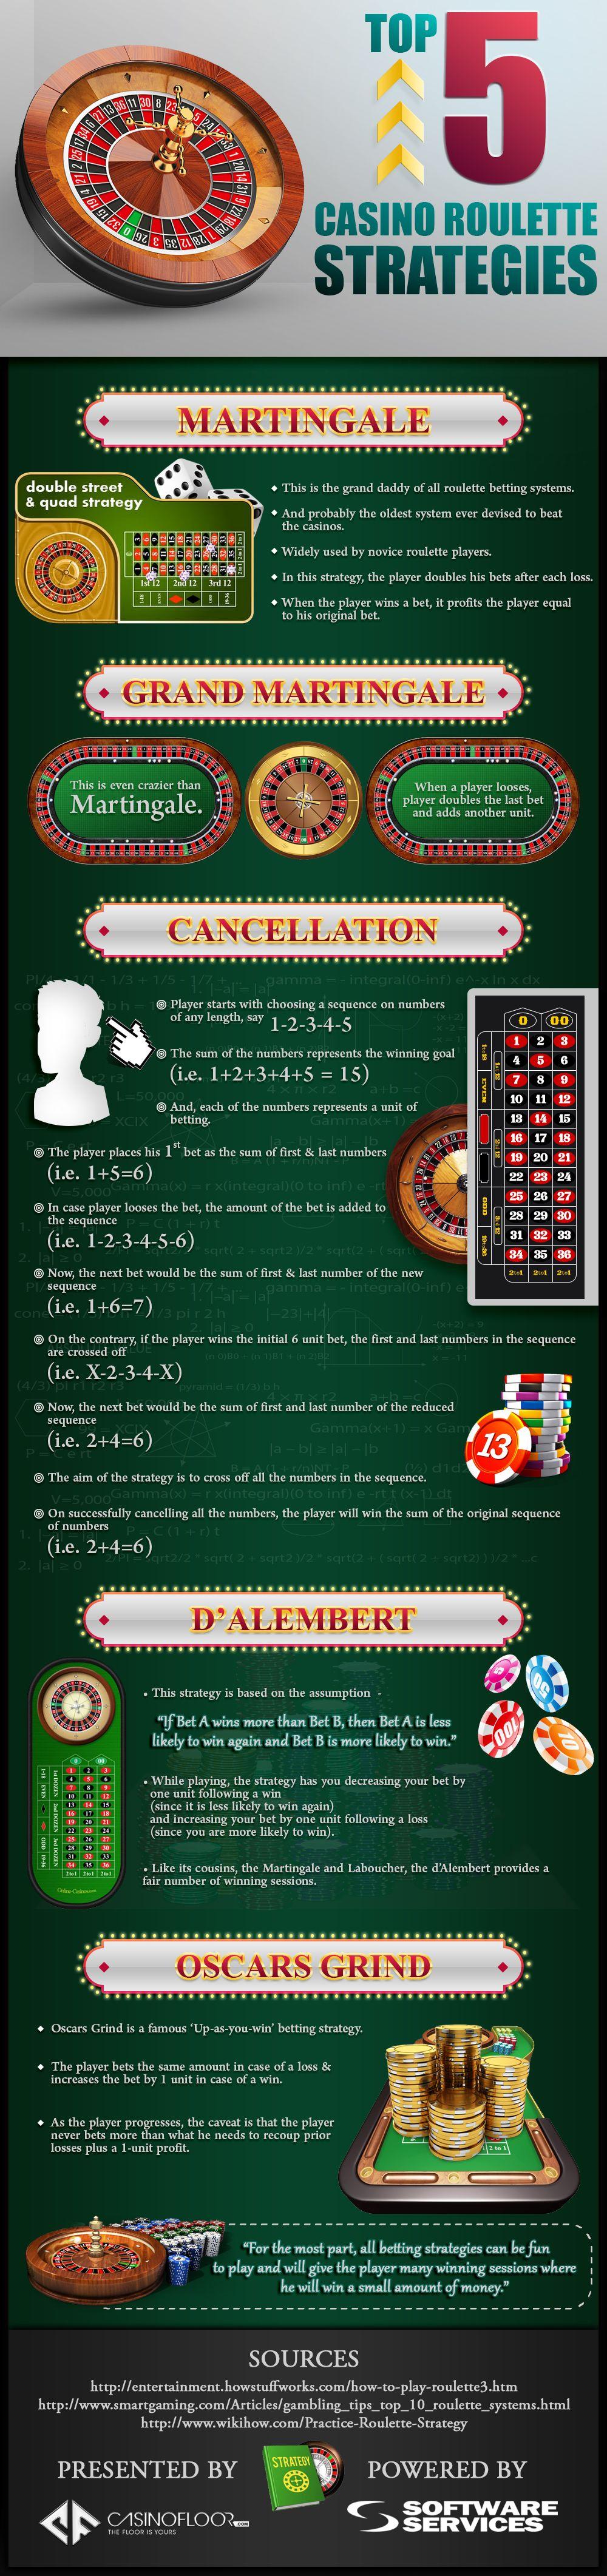 Best strategies all casino games grand casino coushatta houston